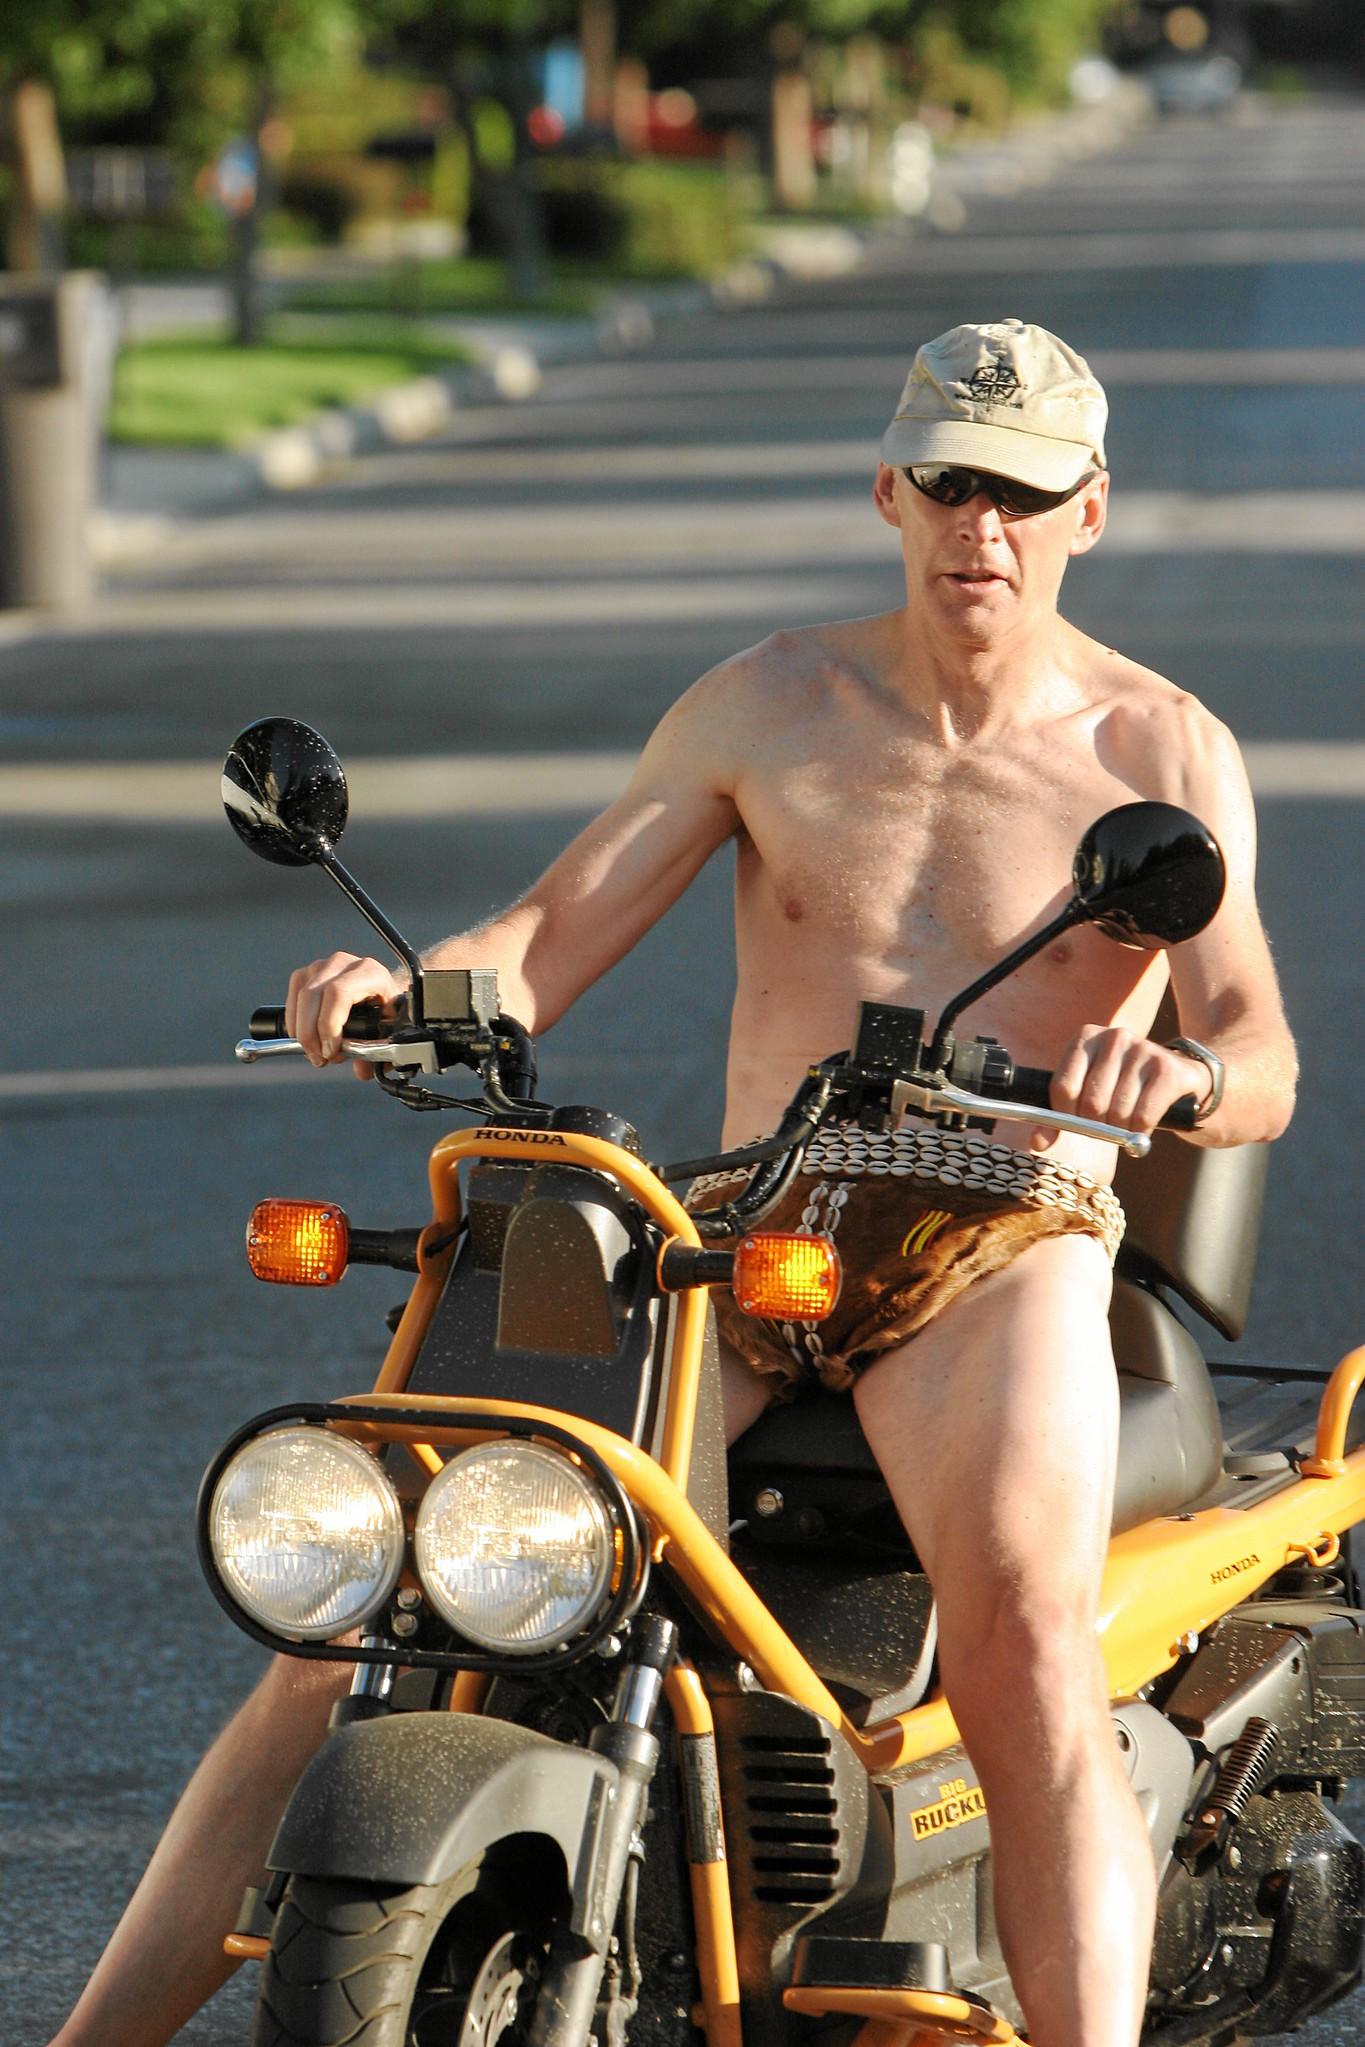 Chris-MacAskill-Baldy-ADV-Forum-Adventure-Rider-Radio-Motorcycle-Podcast-8.jpg